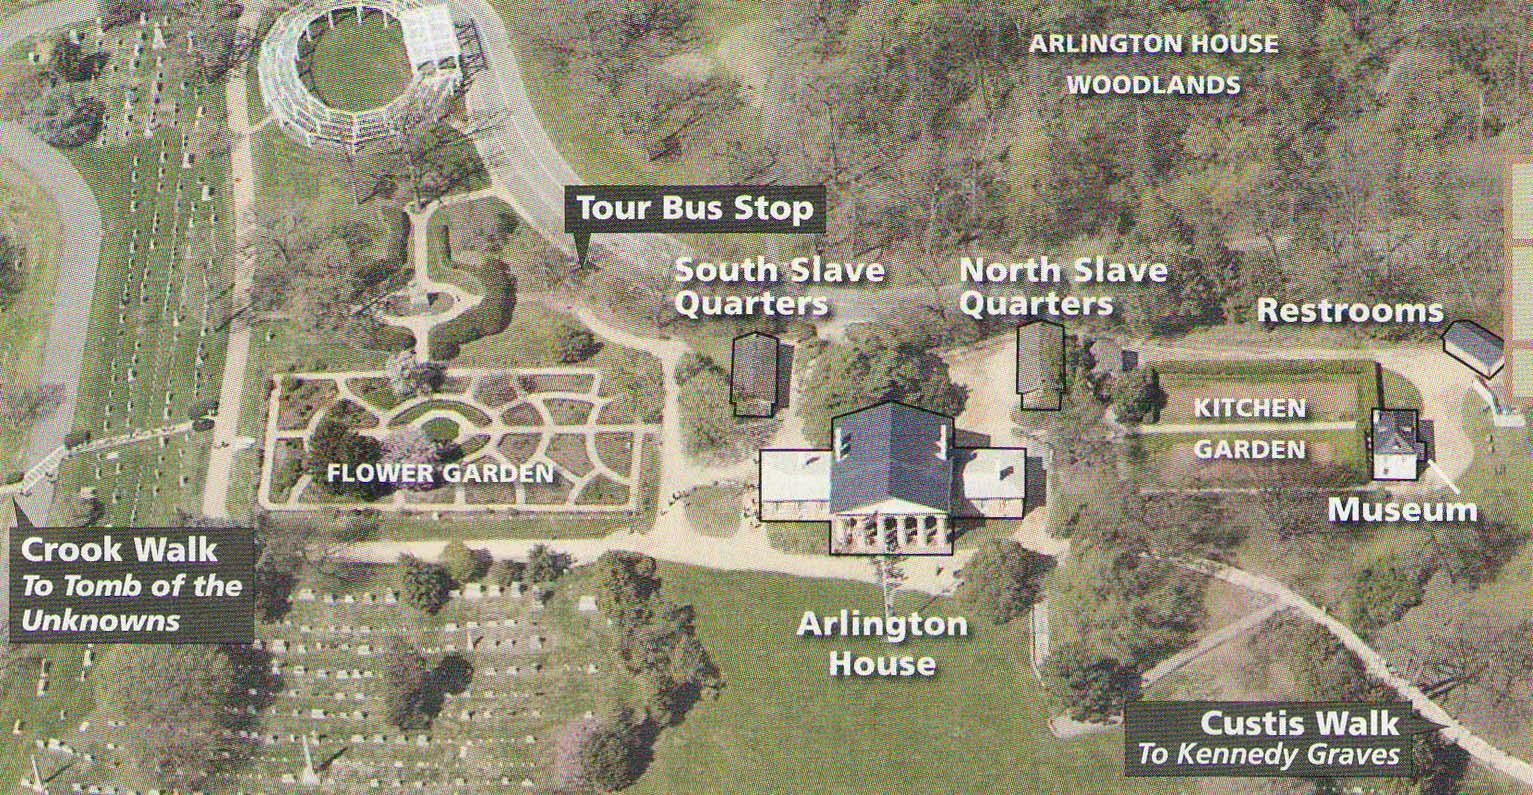 Arlington House, the Robert E. Lee Memorial | PARK MAP |